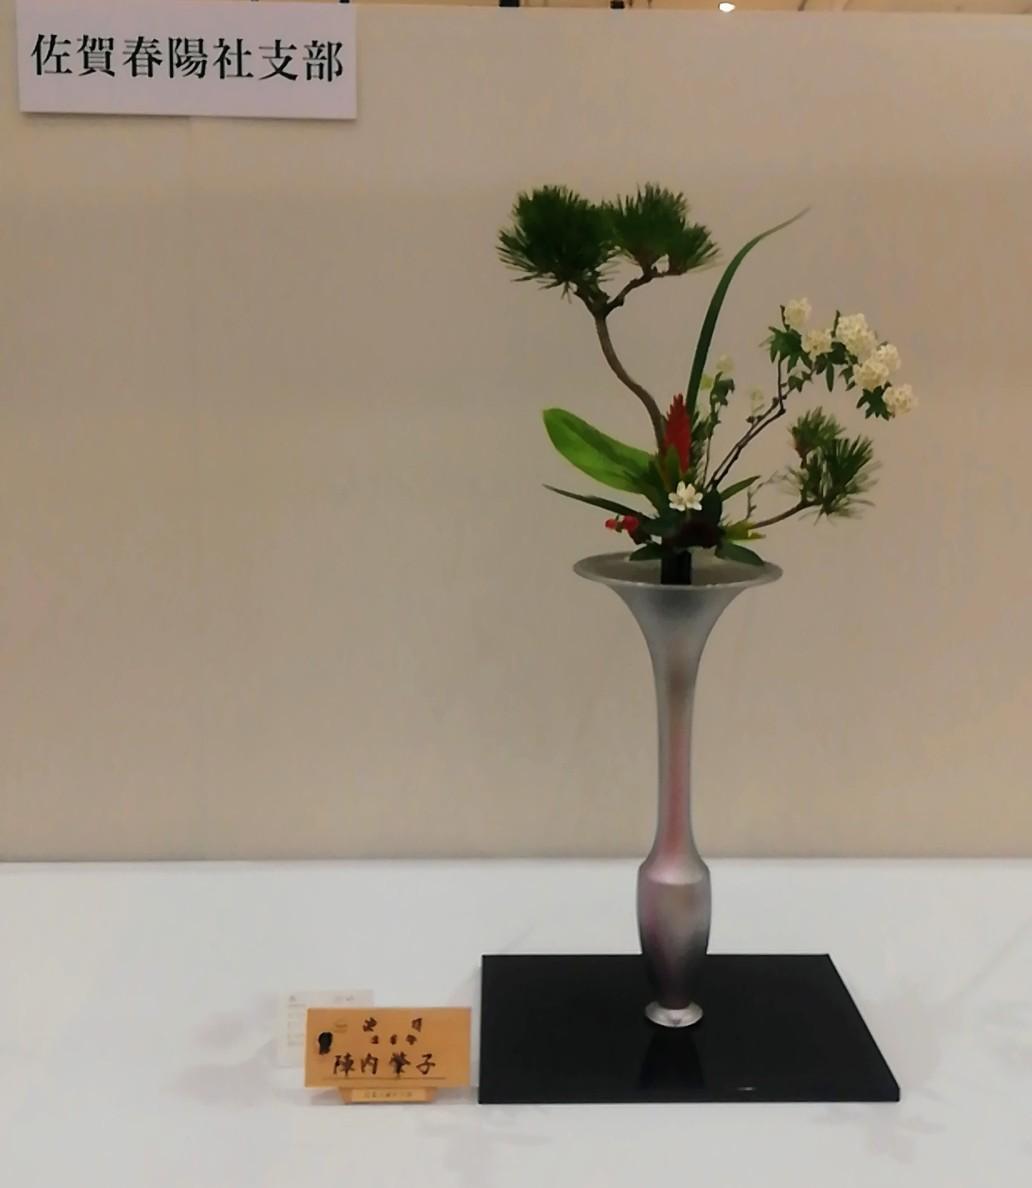 池坊佐賀県連合支部創立100周年記念いけばな池坊展 前期_d0195183_00151632.jpg